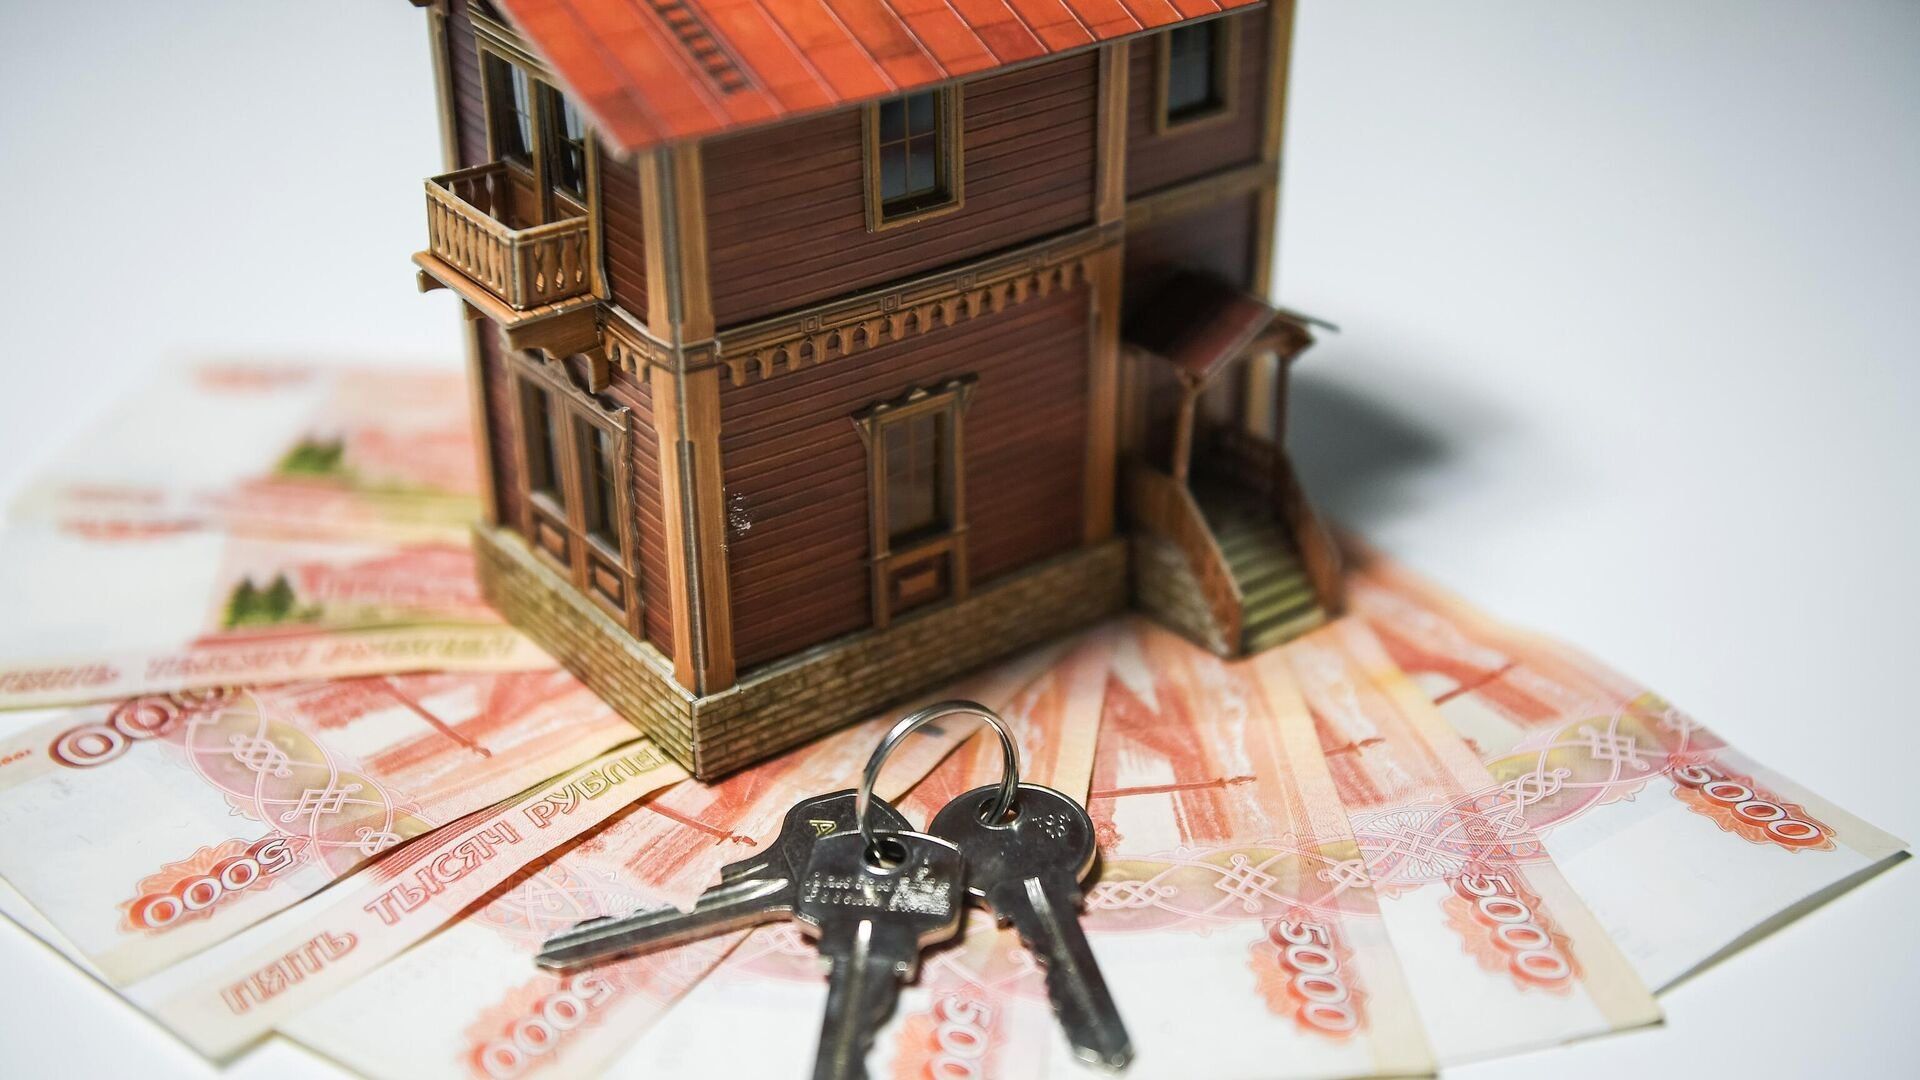 Исследование показало, как кредитная история влияет на одобрение ипотеки